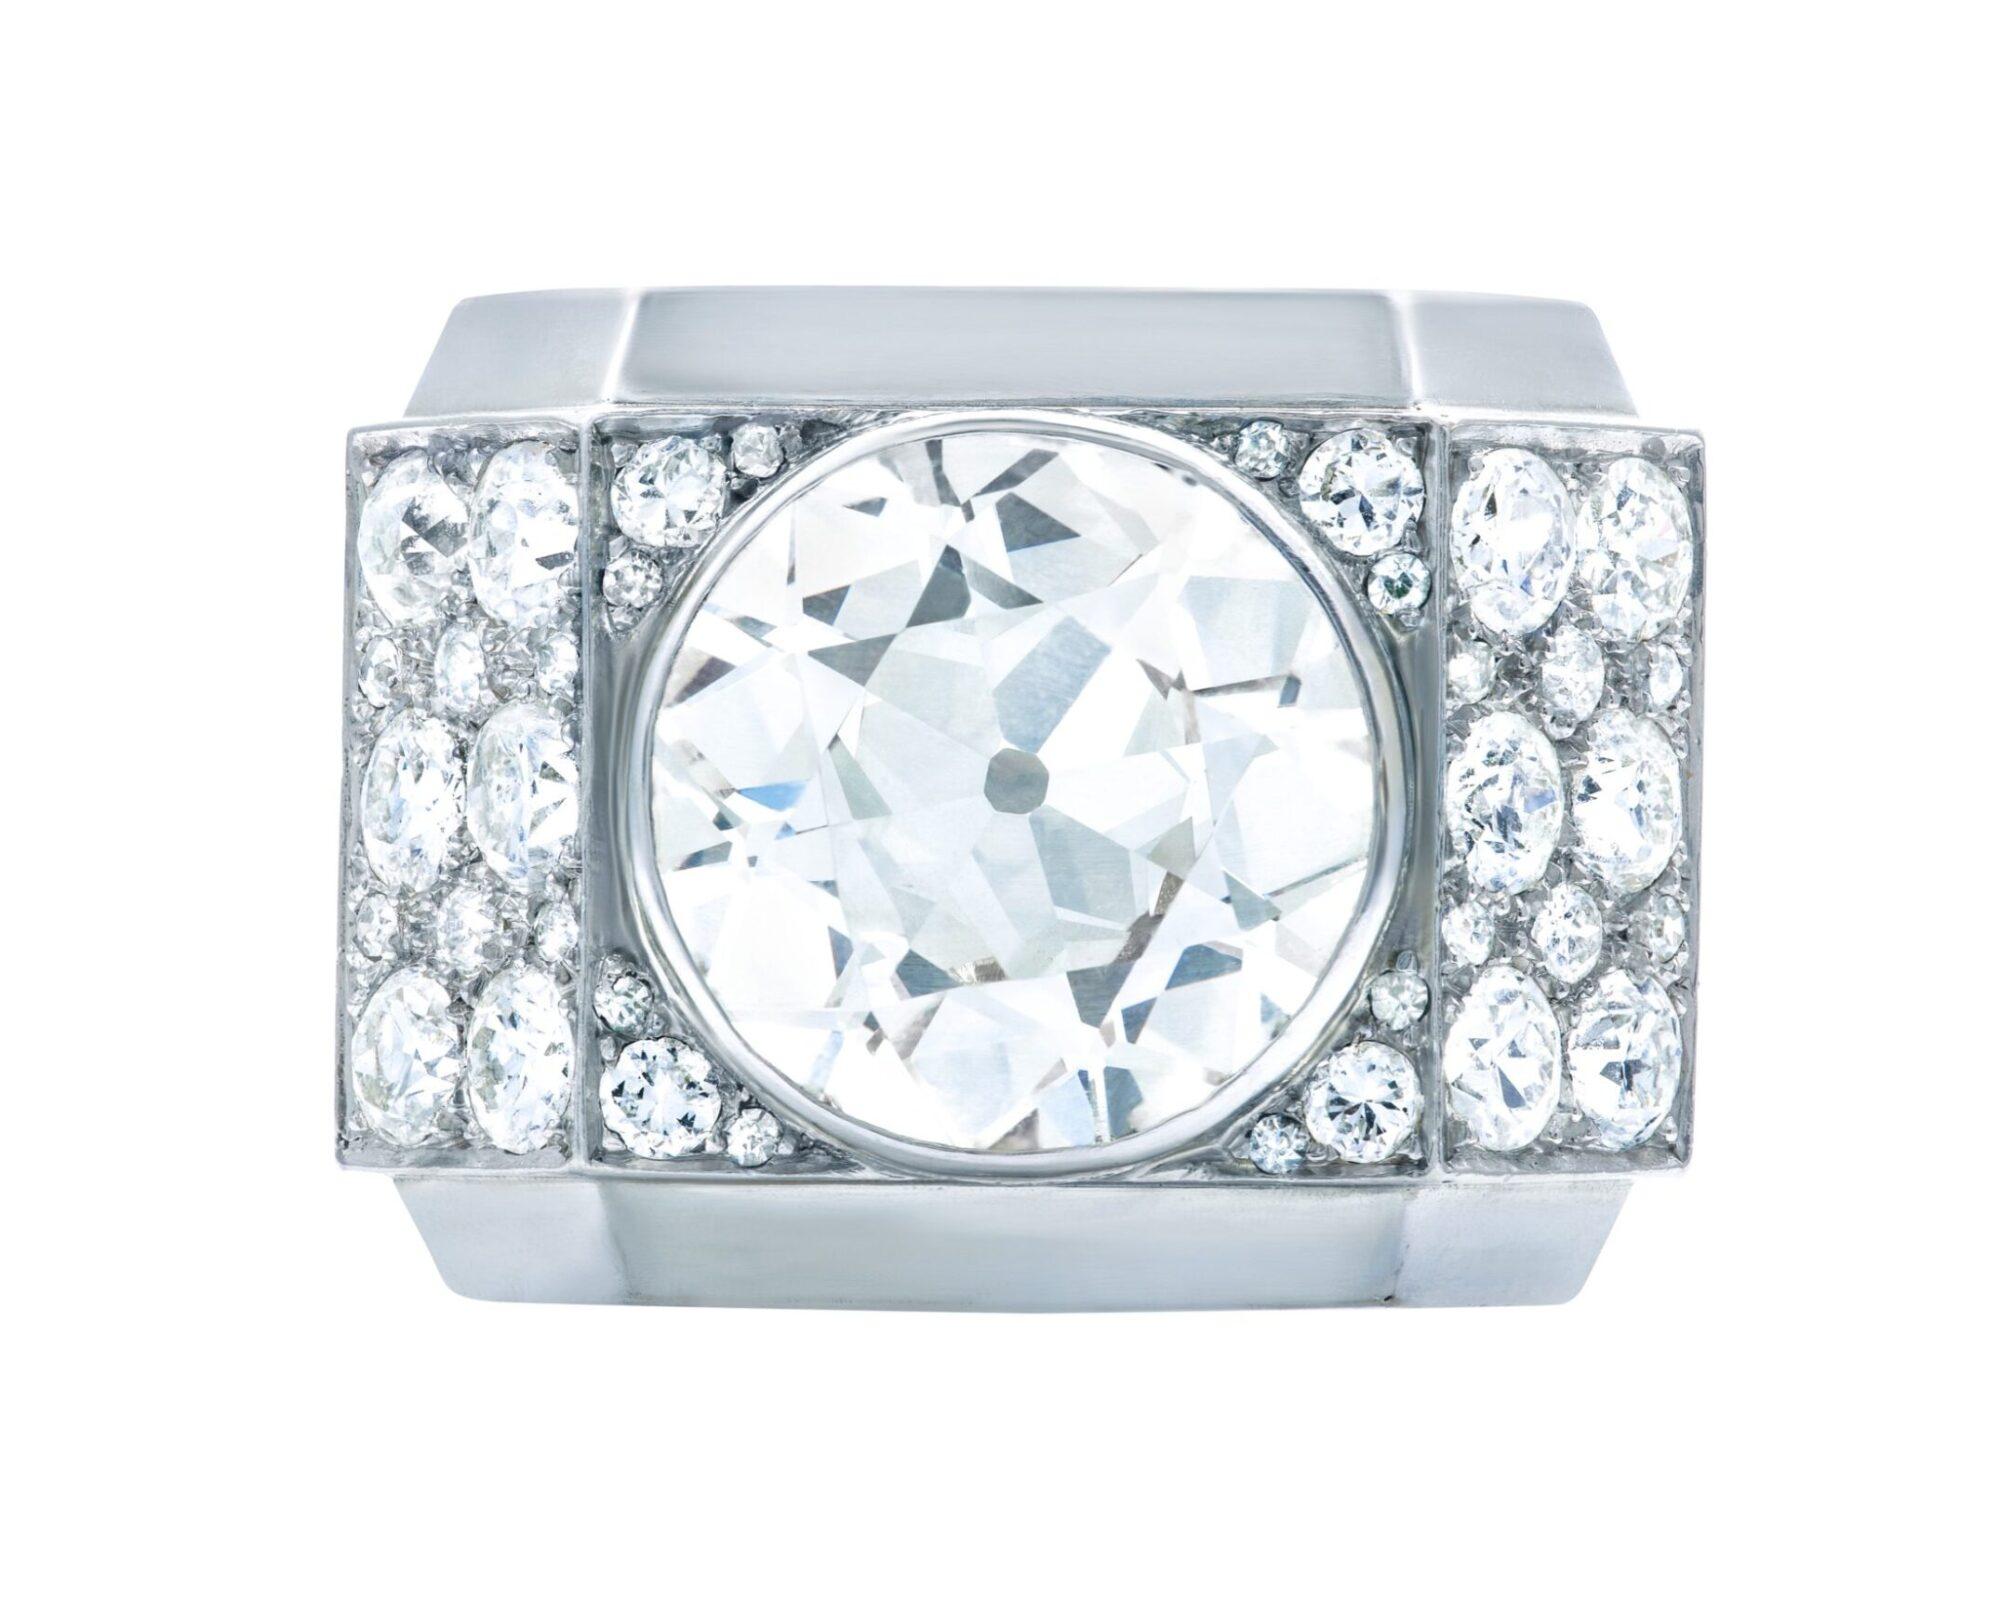 Art-diamond-ring-by-Rene-Boivin-estimate-CHF 100000-150000